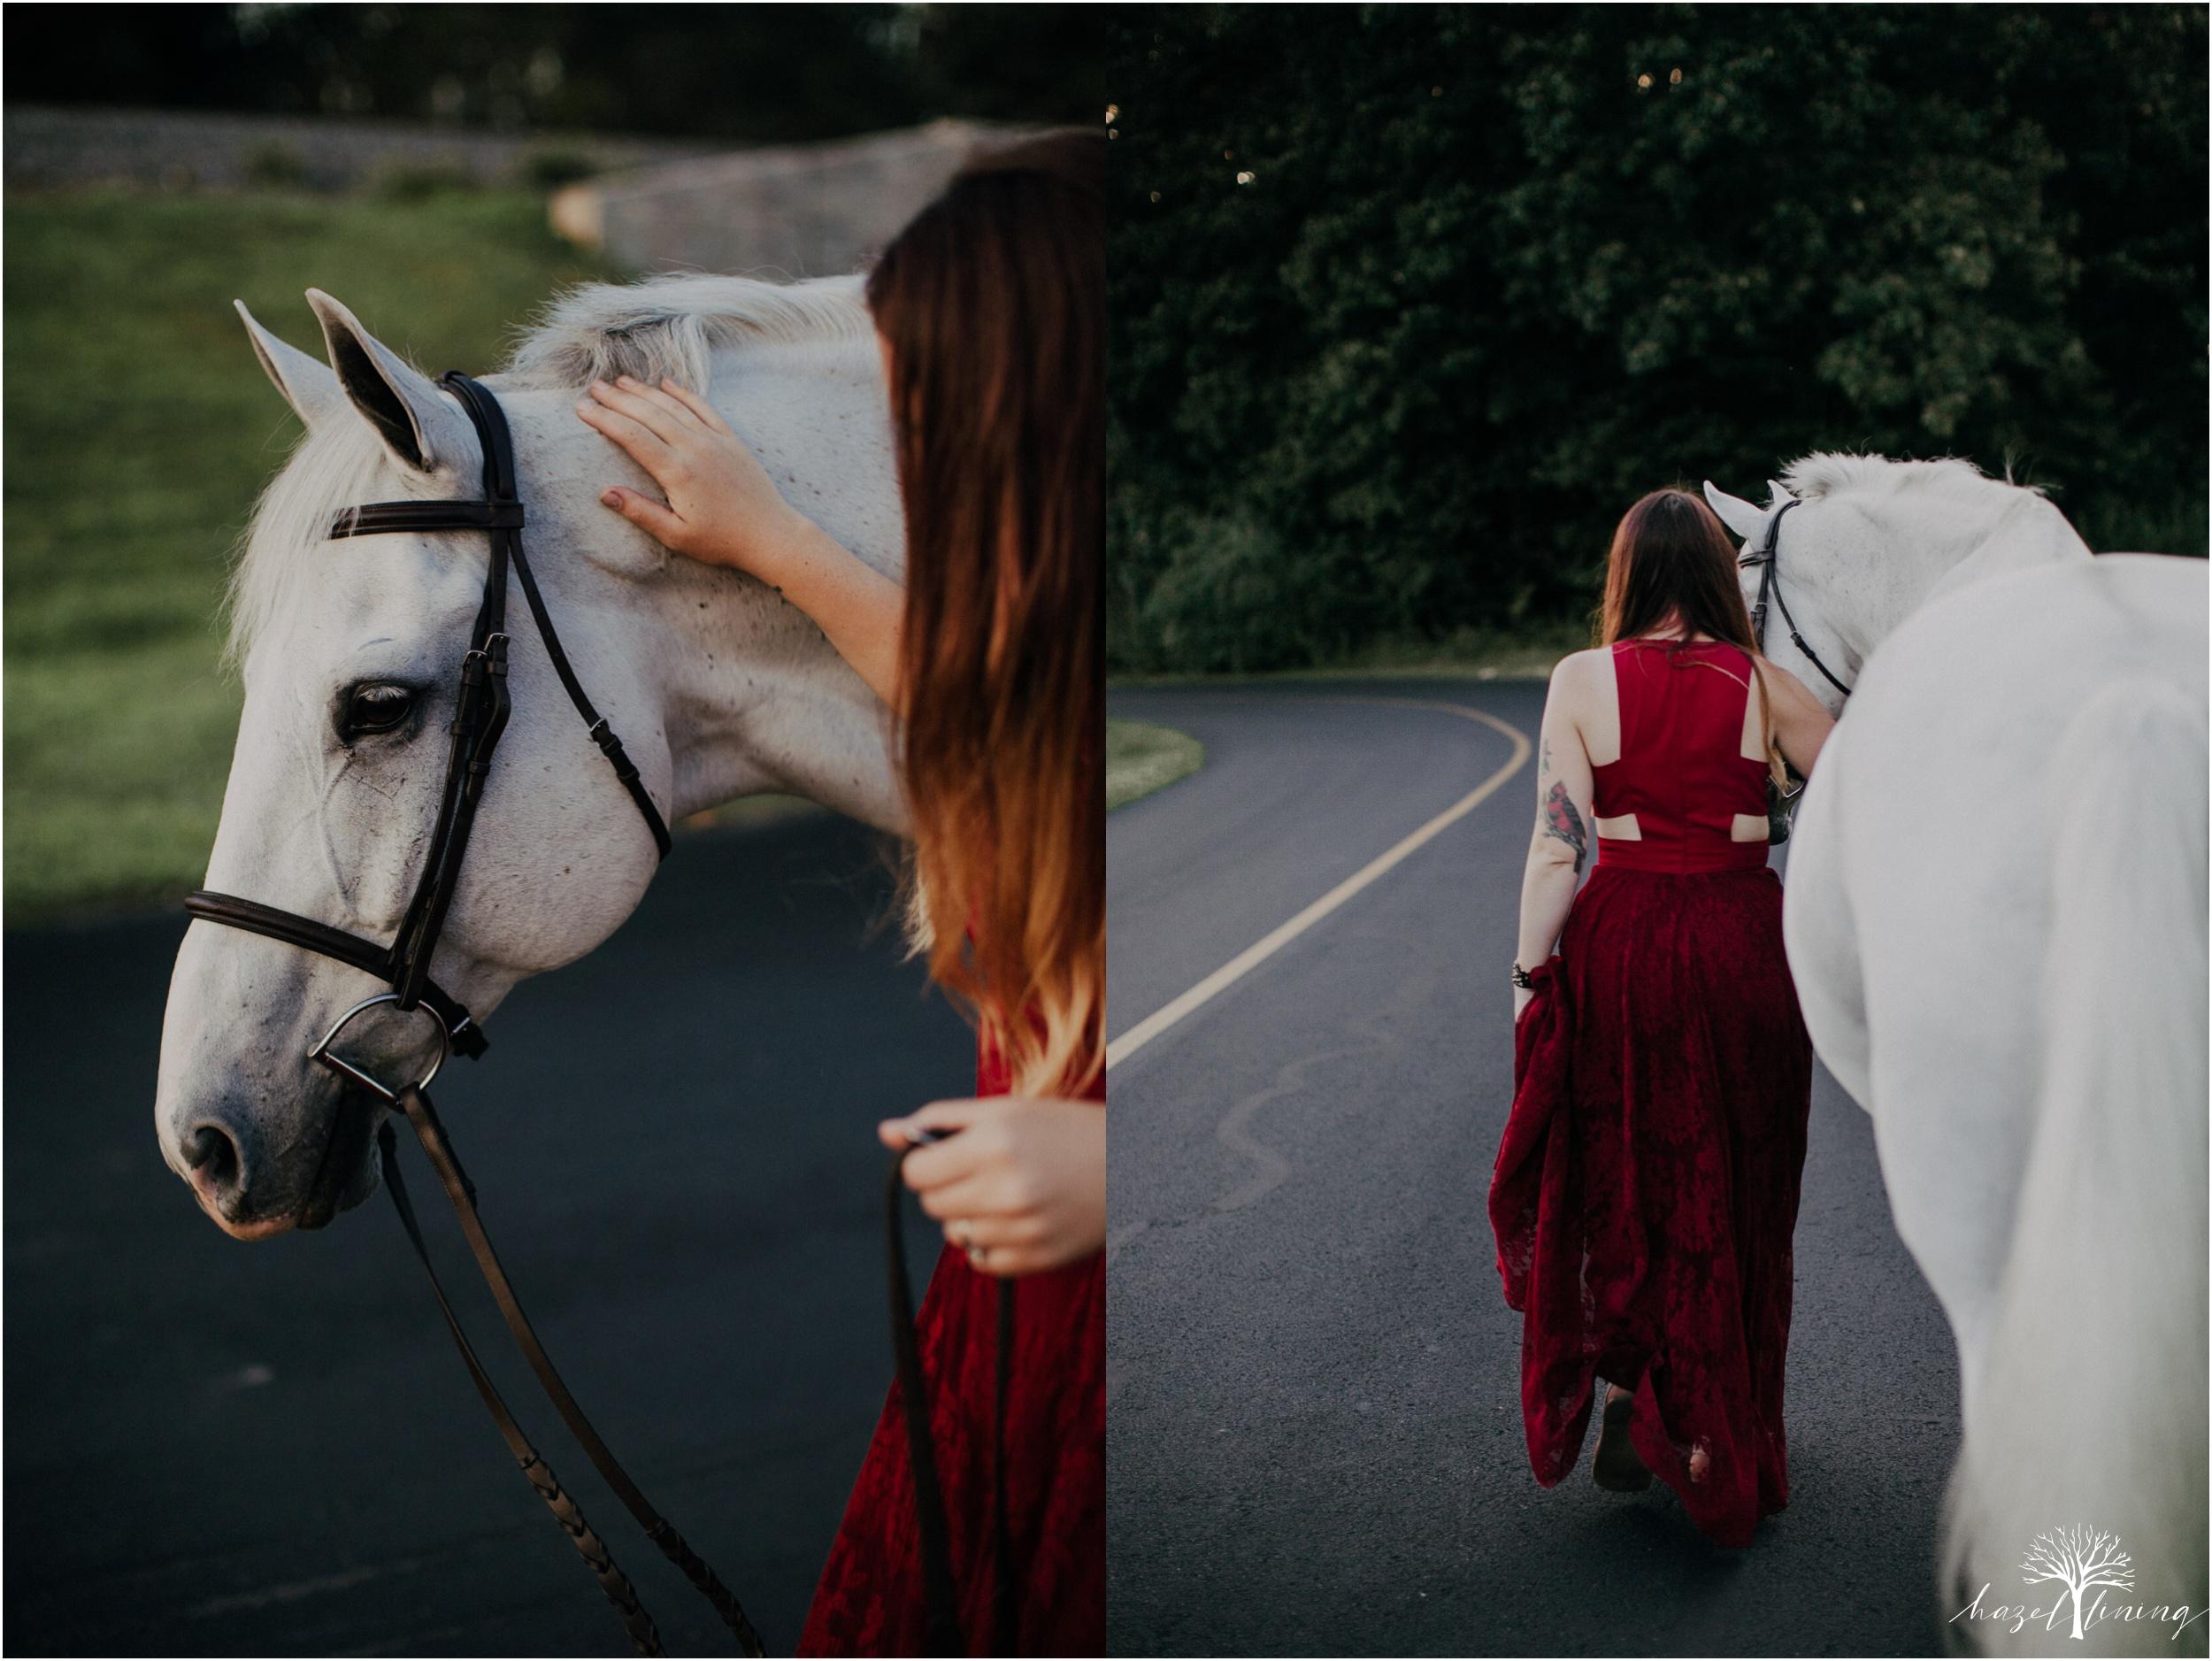 taylor-adams-and-horse-delaware-valley-university-delval-summer-equestrian-portrait-session-hazel-lining-photography-destination-elopement-wedding-engagement-photography_0056.jpg